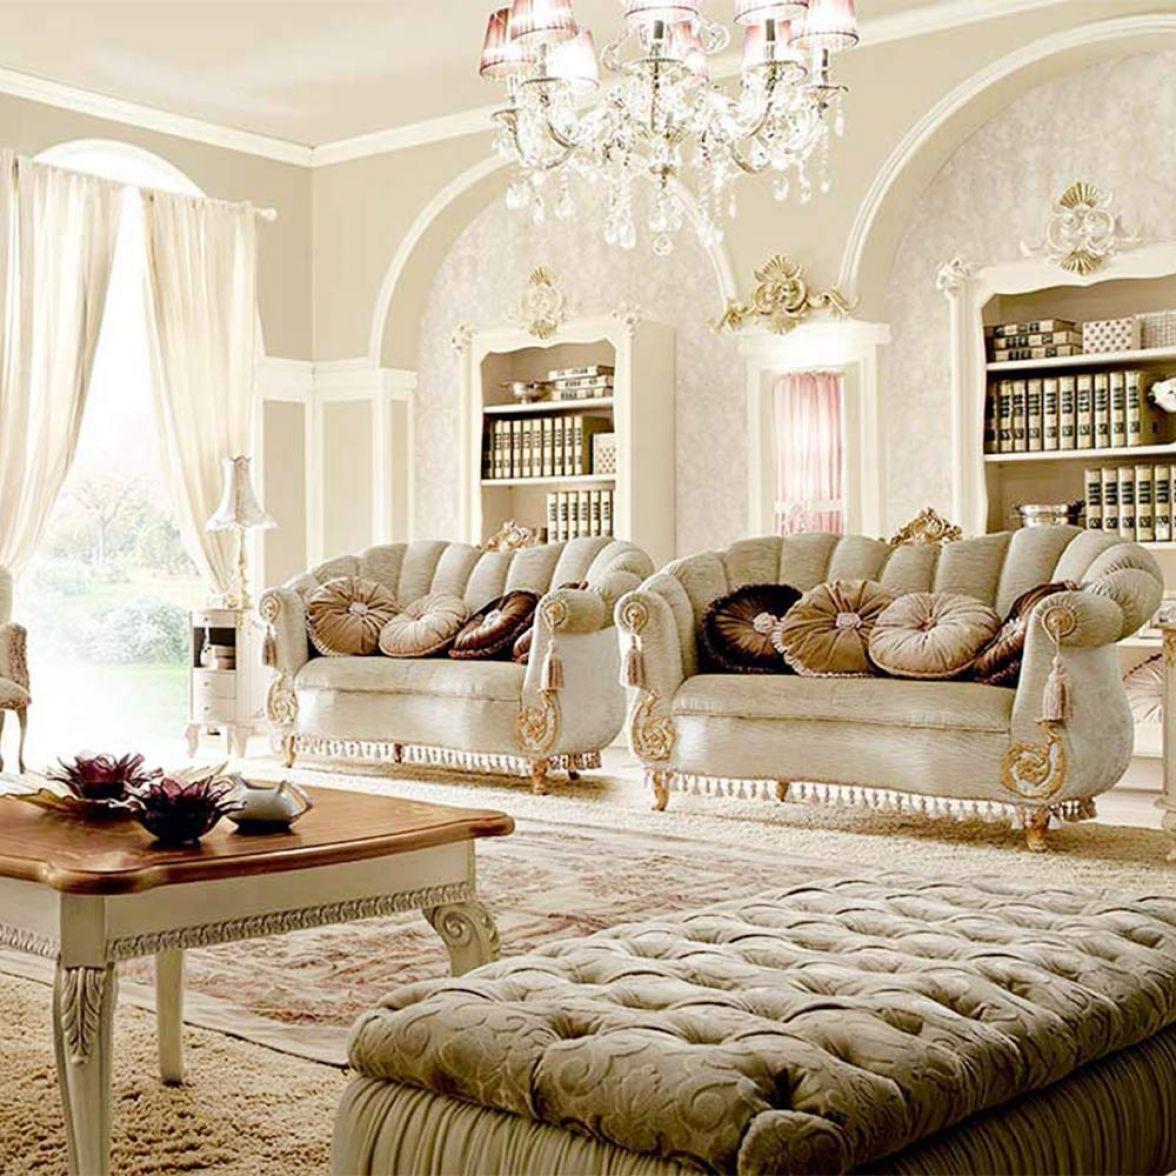 Vip Art Living room